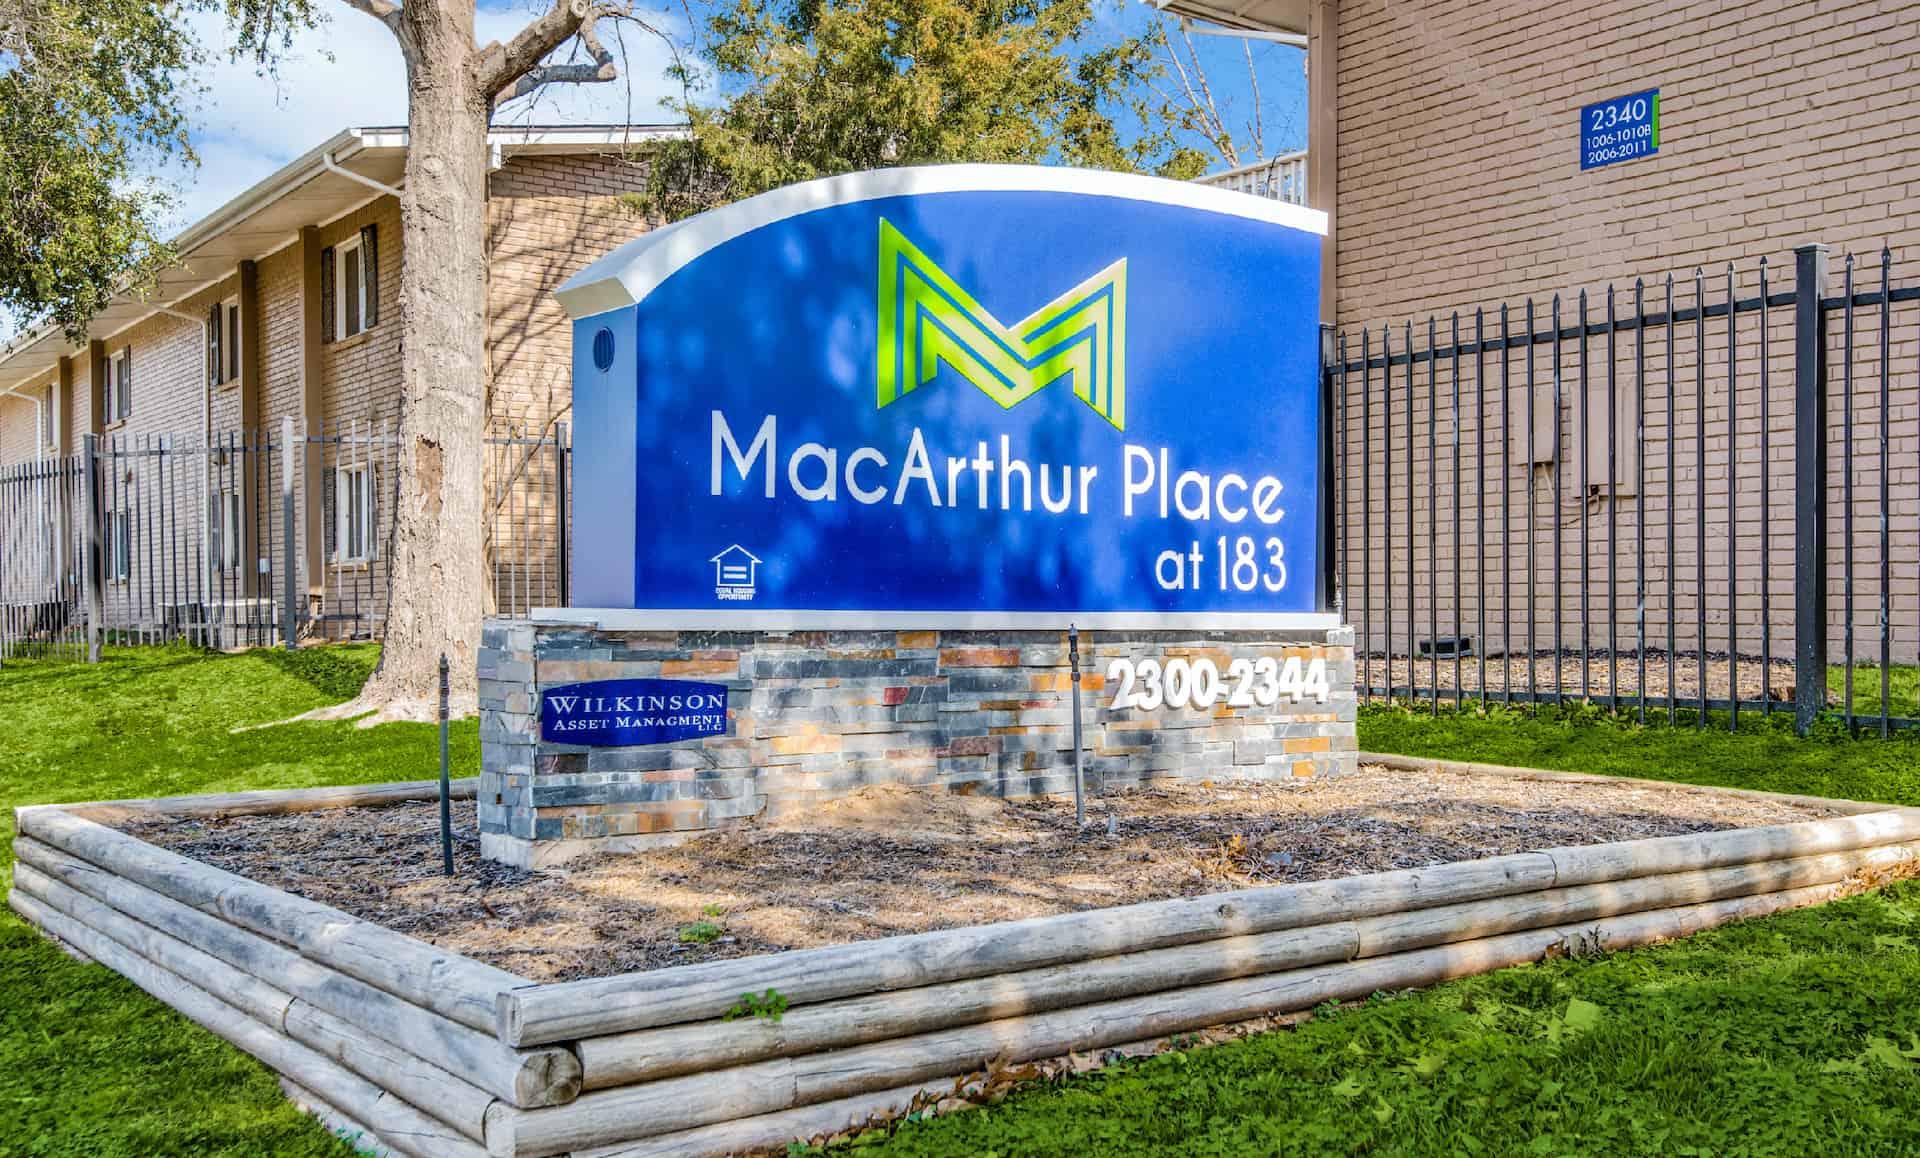 MacArthur Place